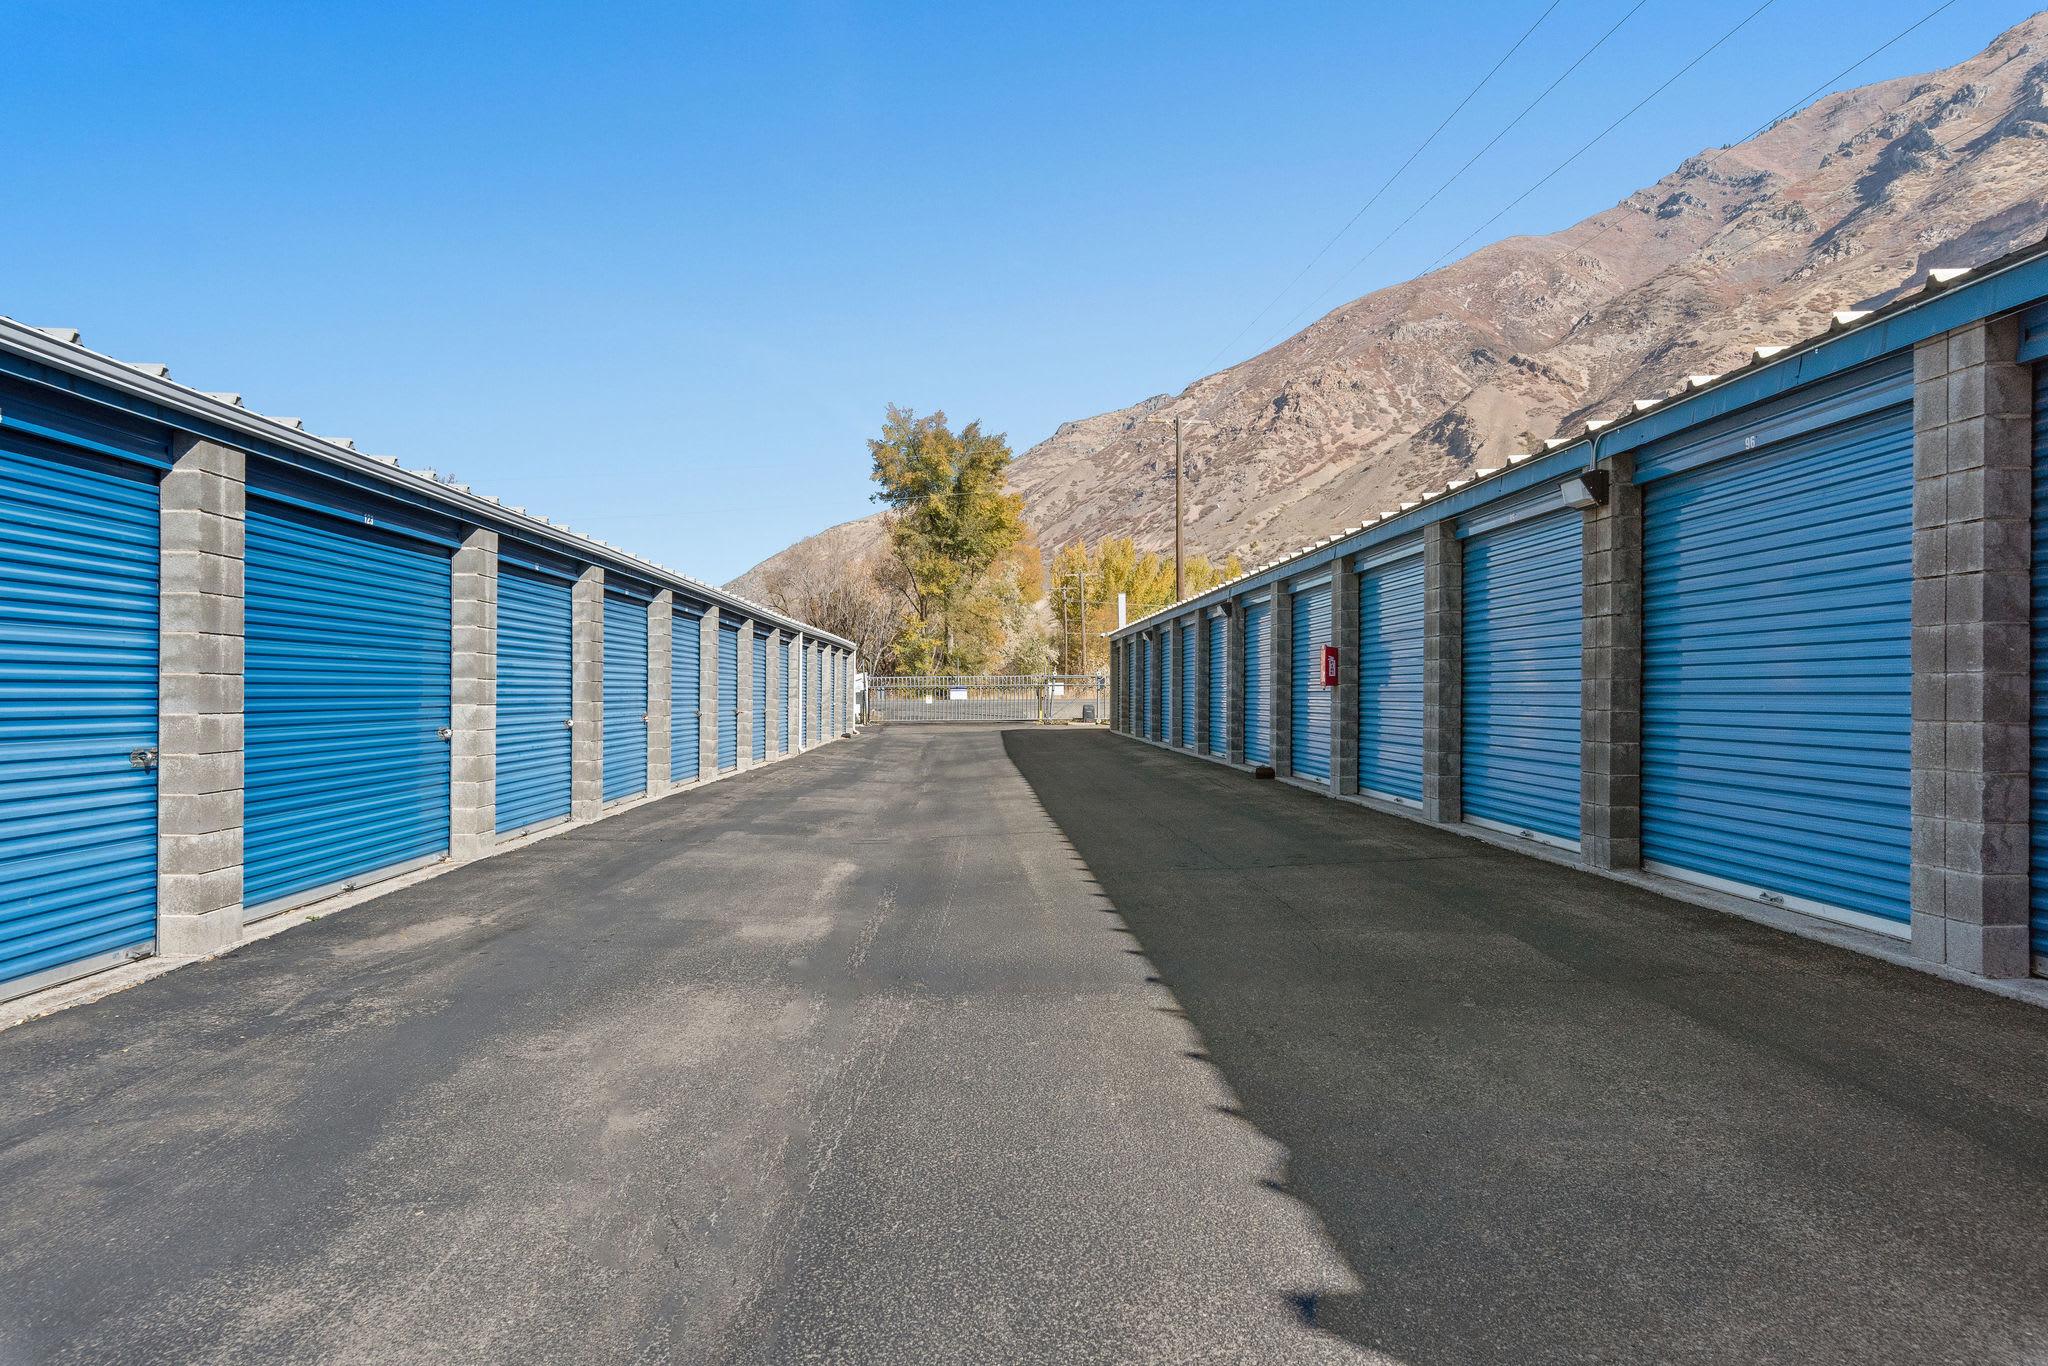 Wide driveways at Stor'em Self Storage in Springville, Utah